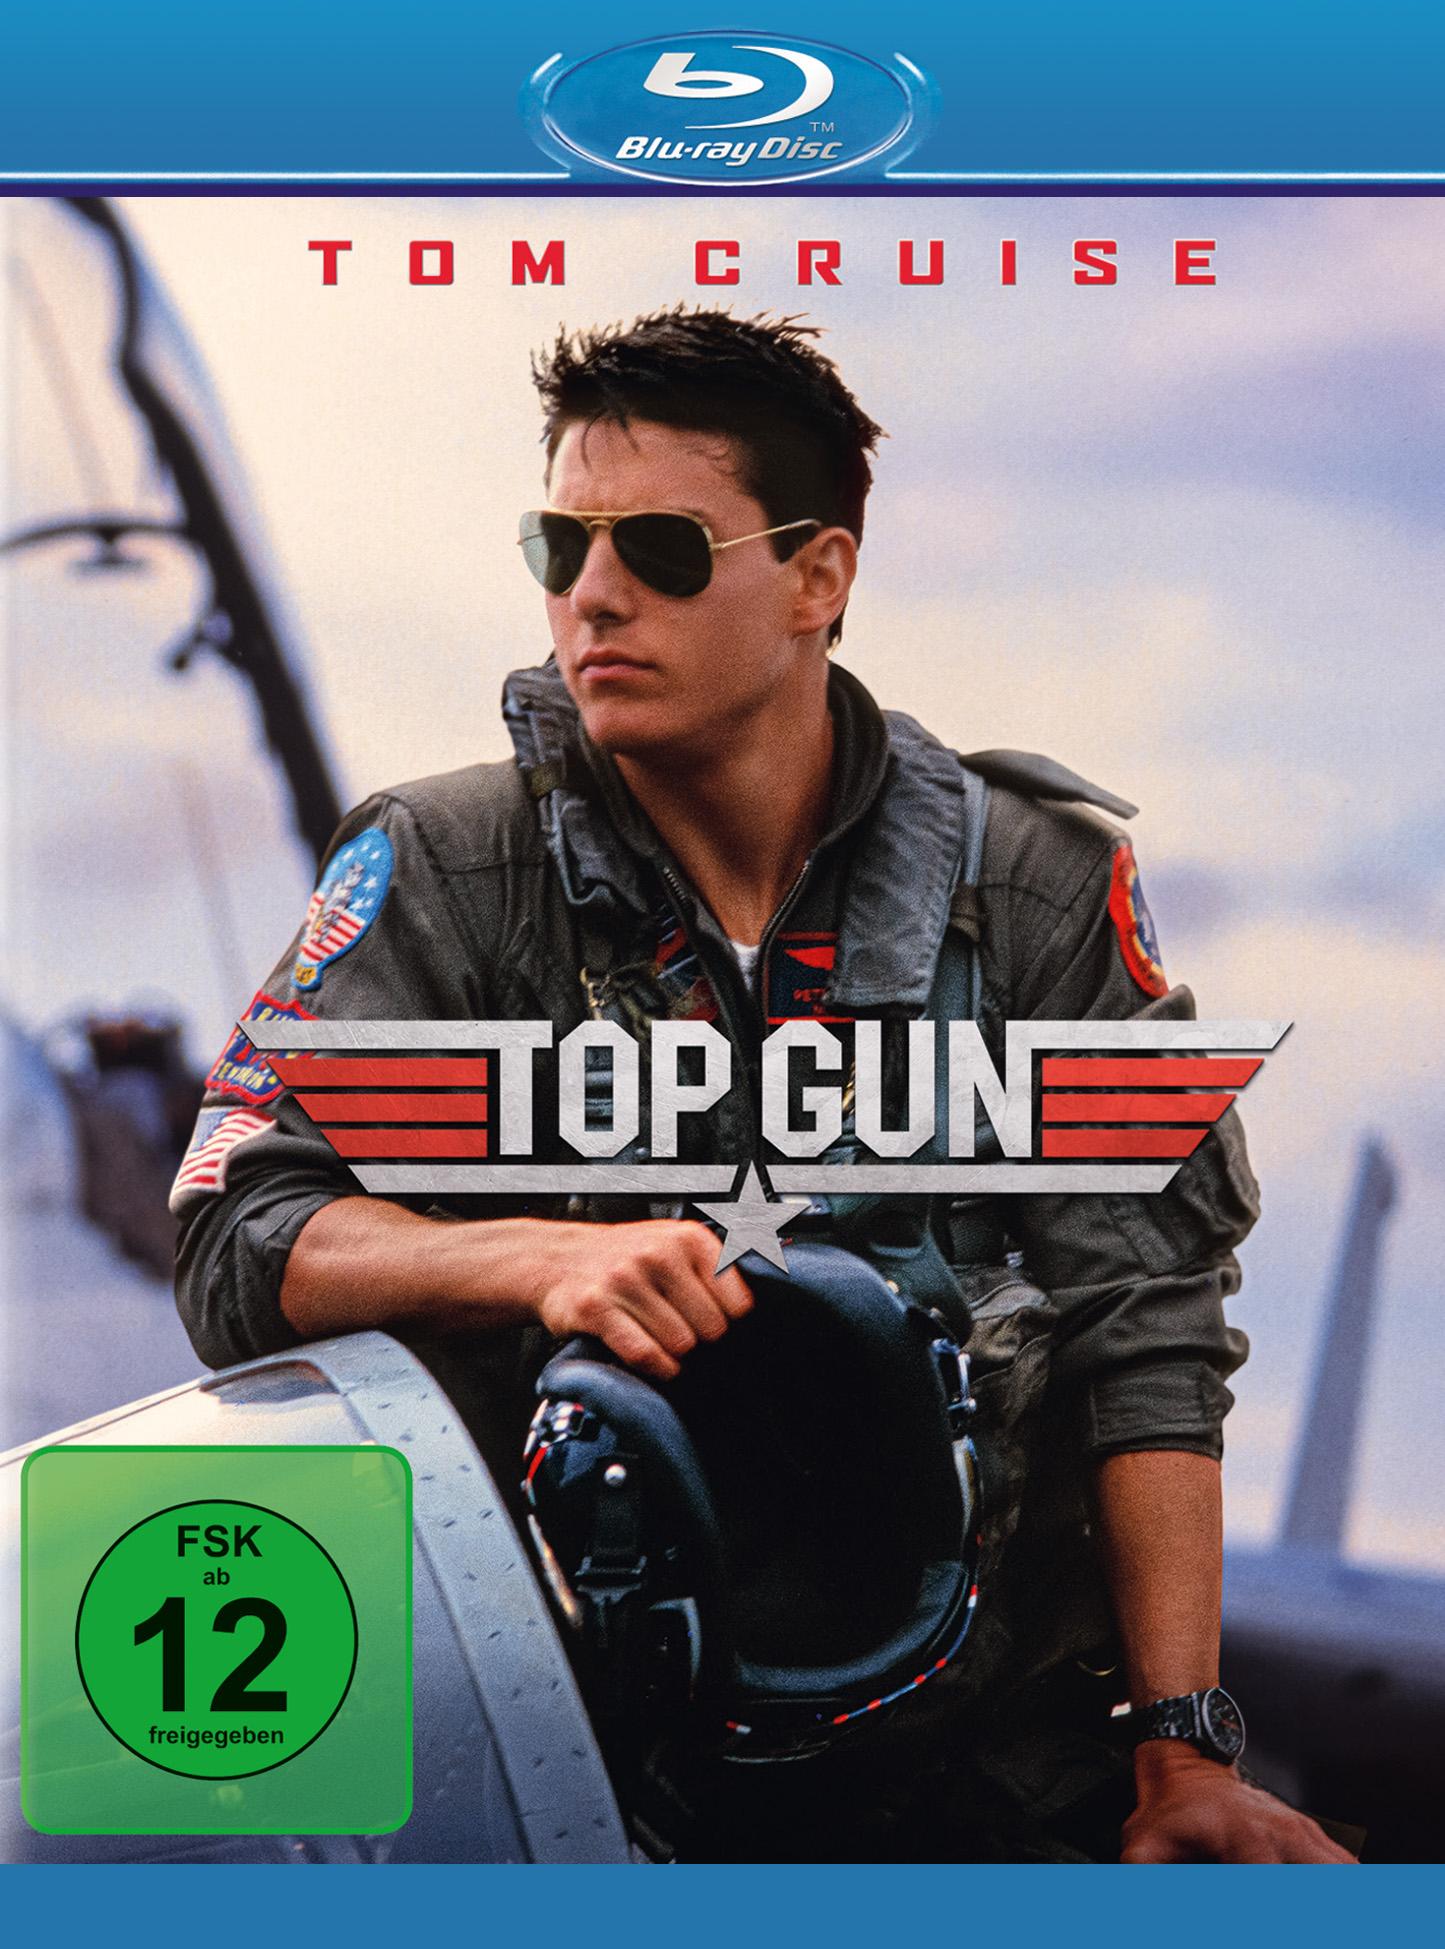 Tom cruise frisur top gun